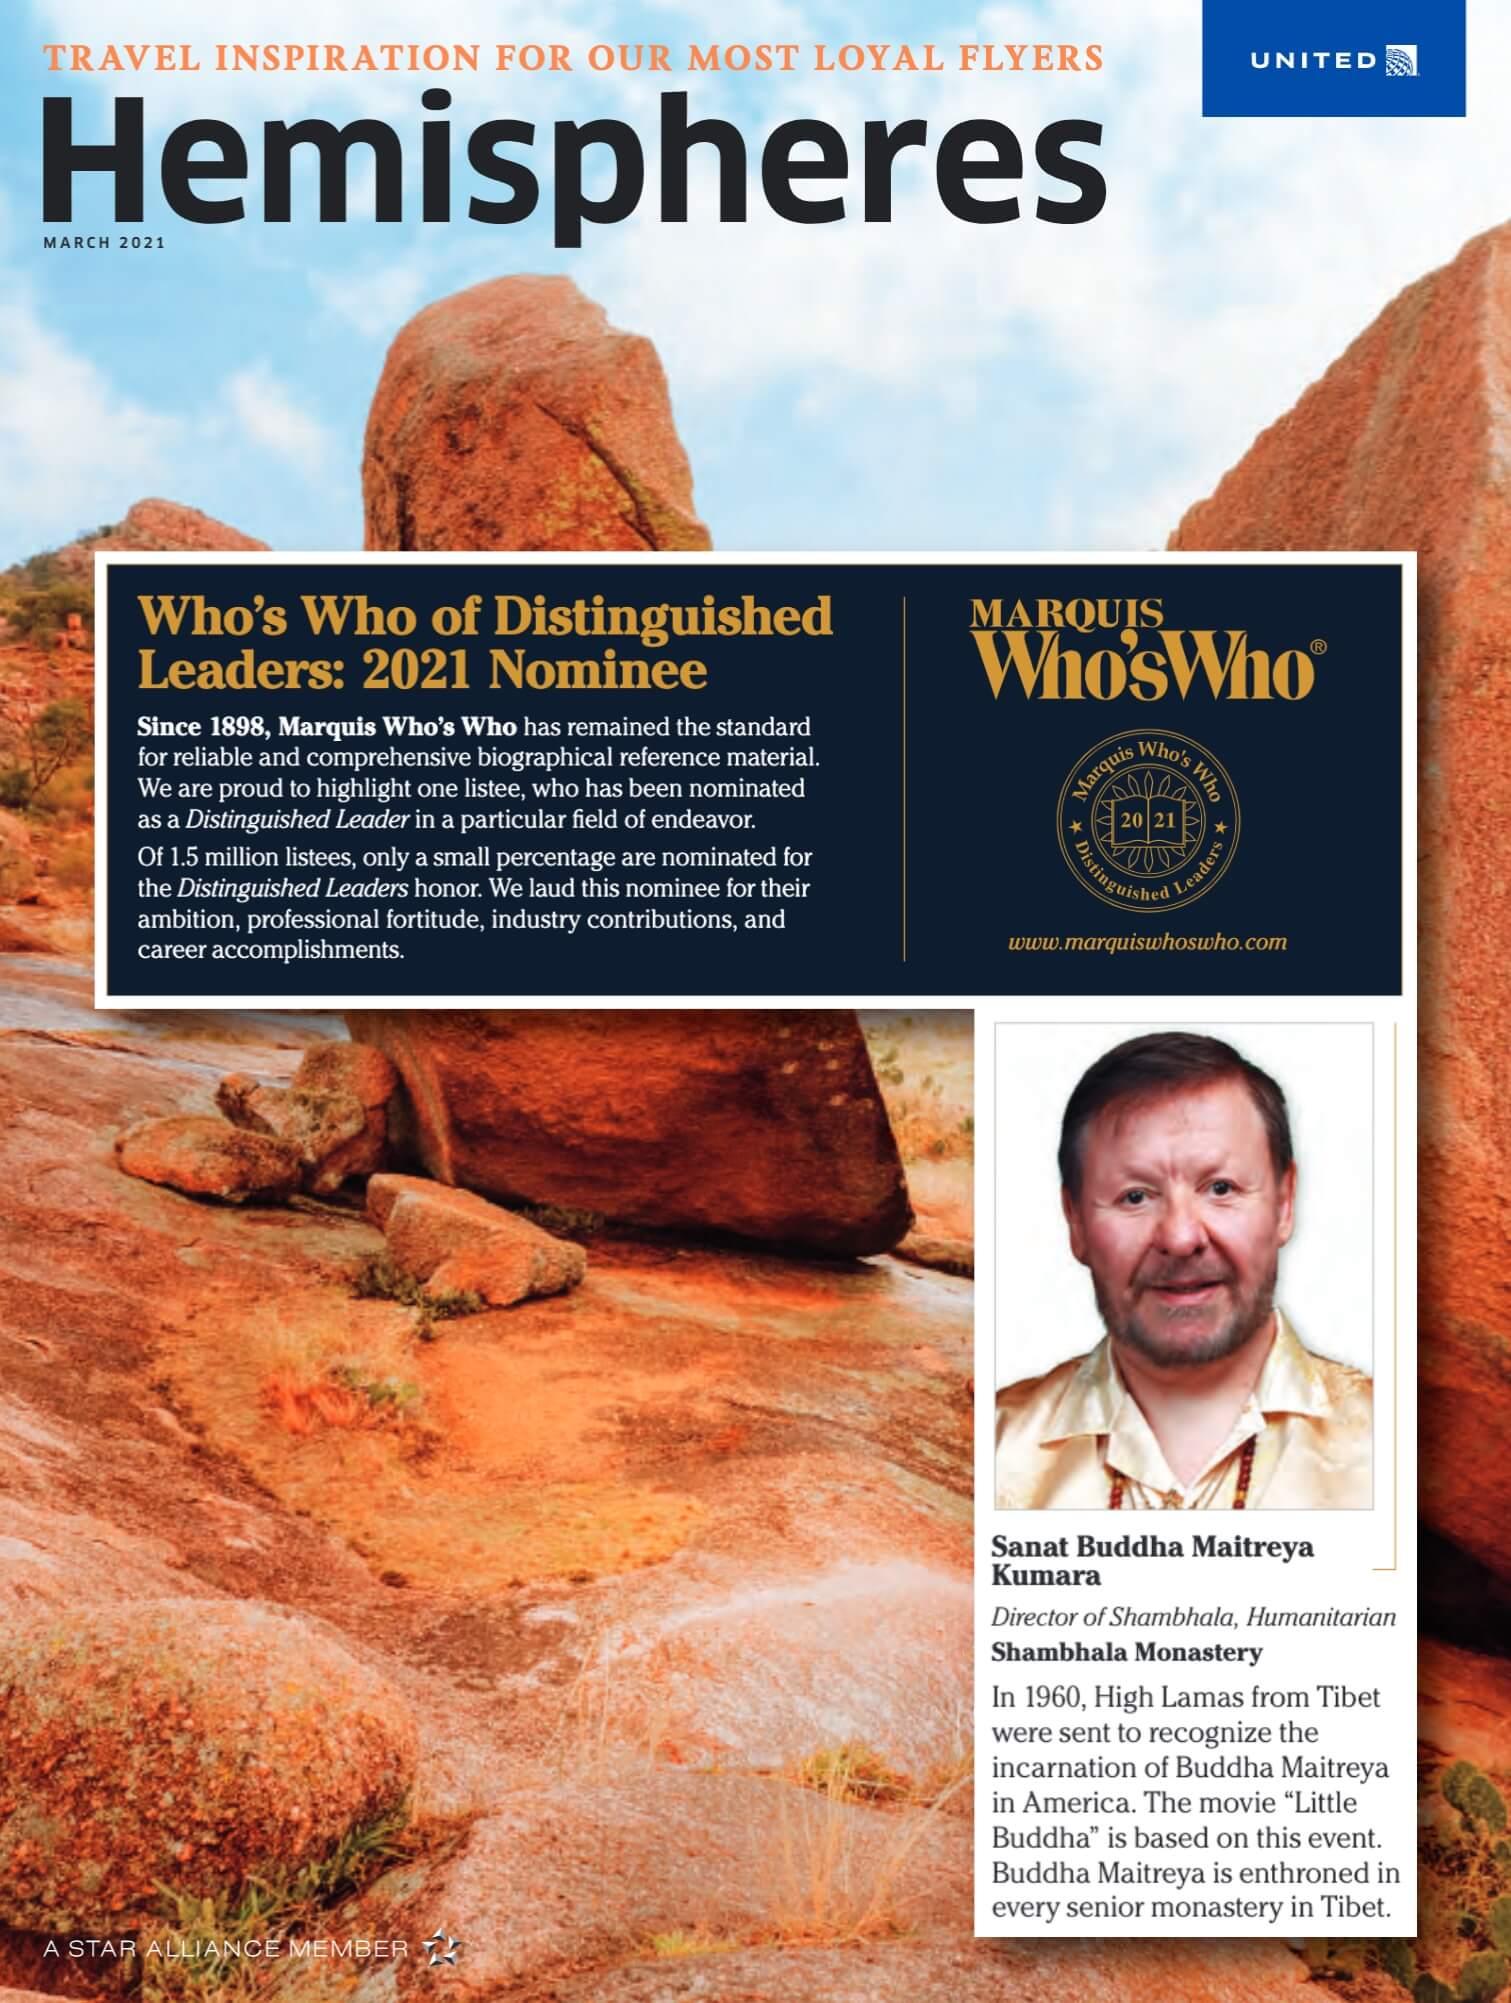 Sanat Buddha Maitreya Kumara Marquis Who's Who mention in March 2021 Issue of United Airline's Hemispheres Magazine